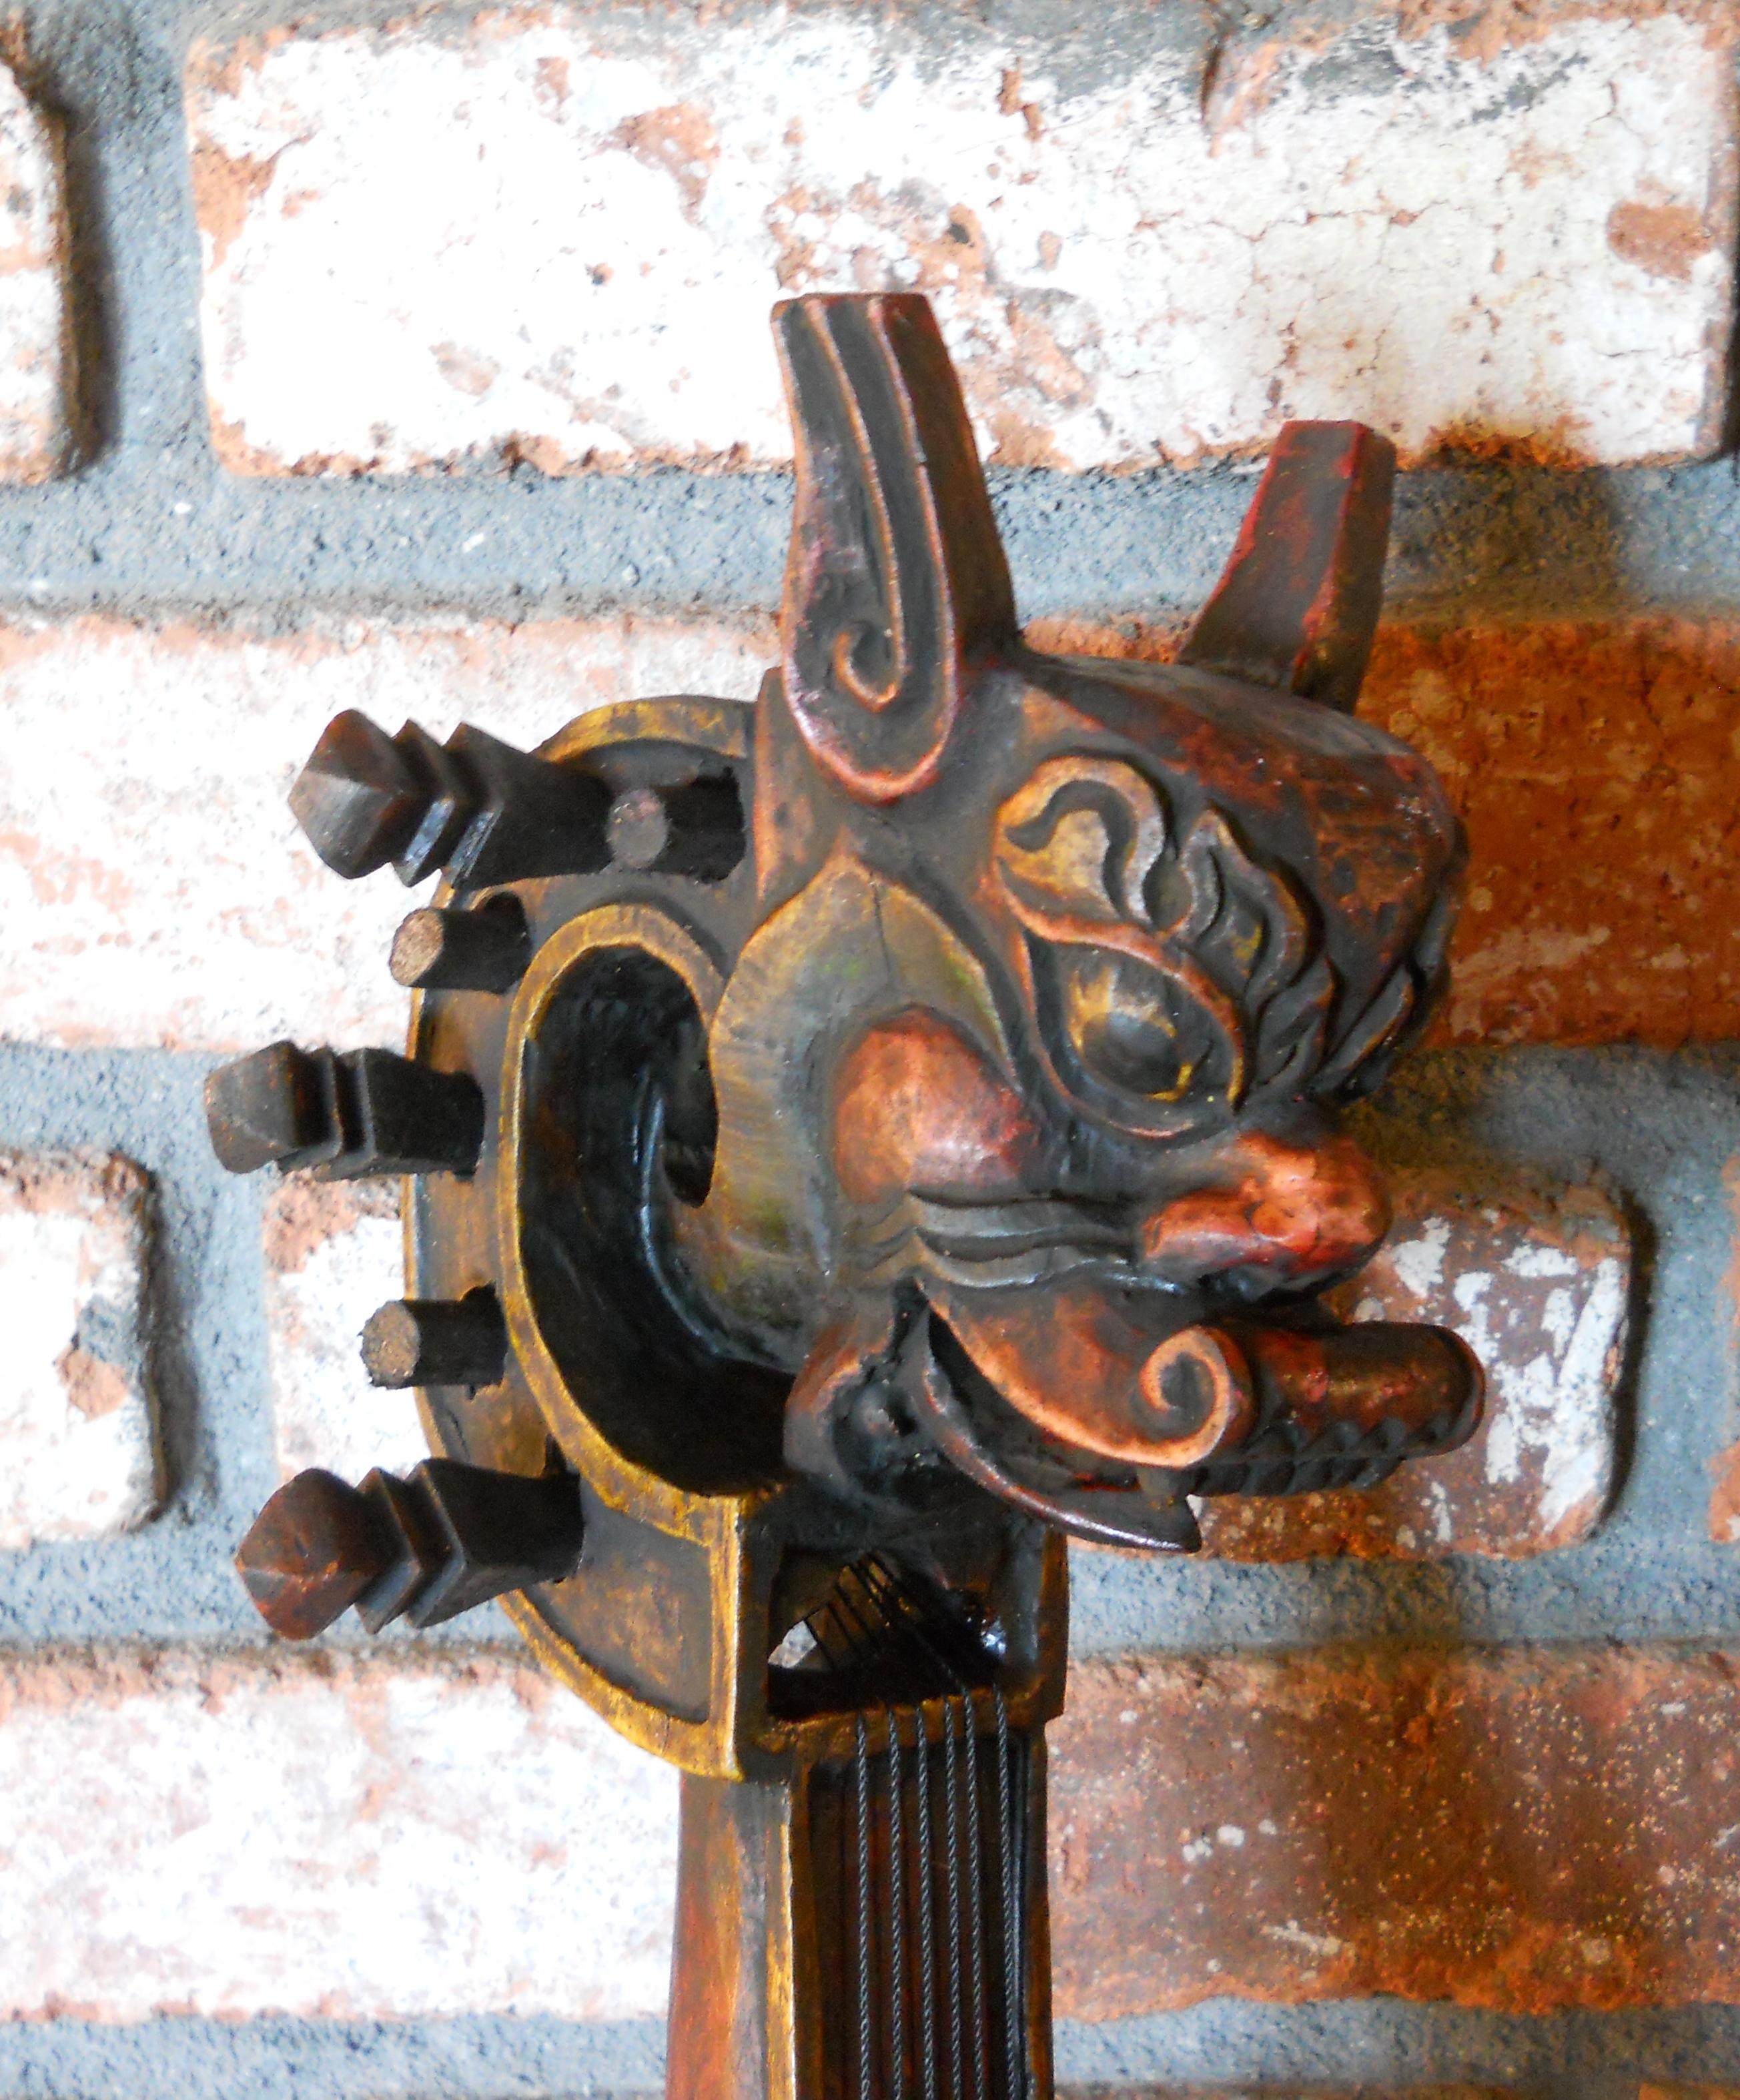 Tibetan Musical Instruments